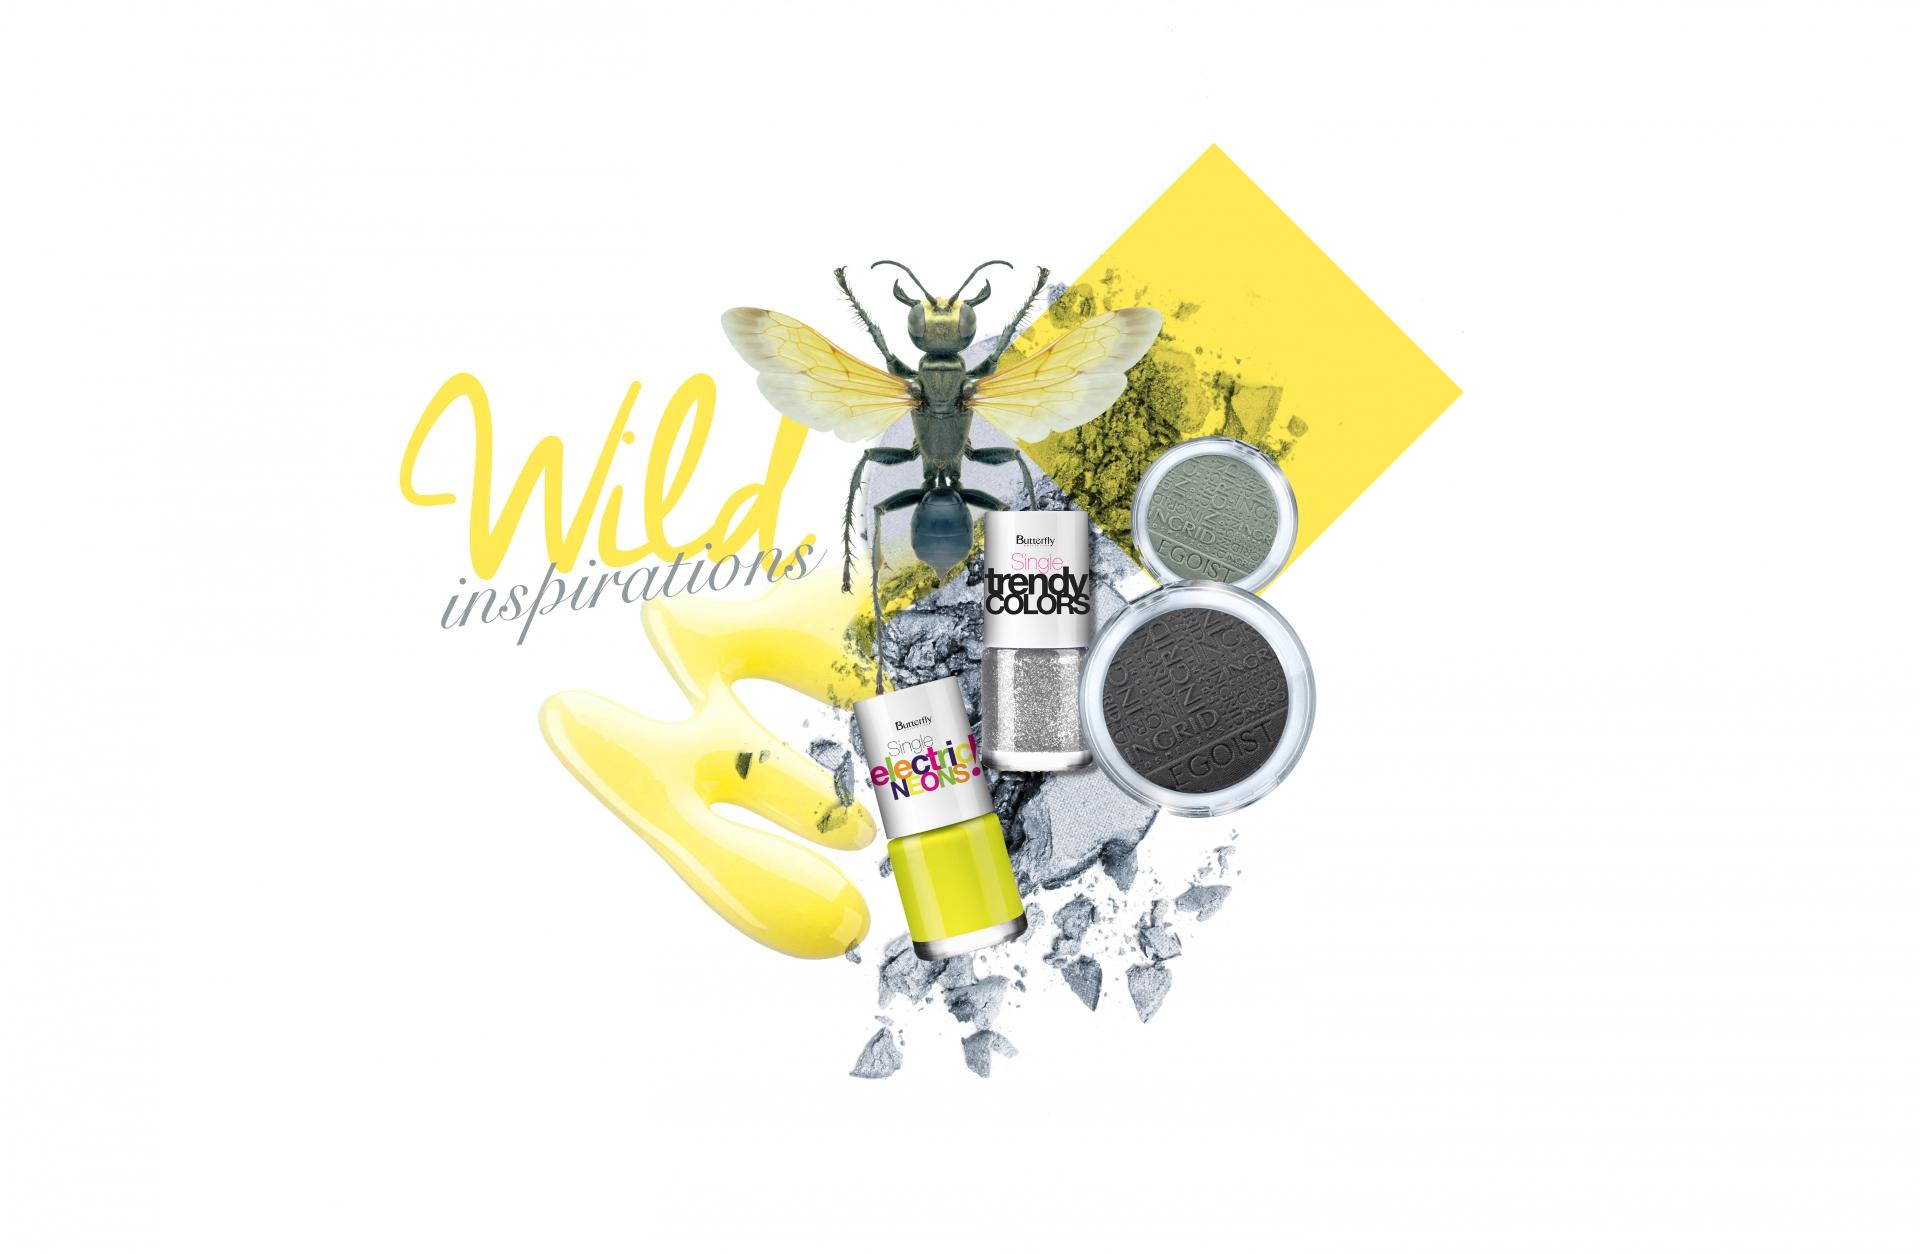 wild inspirations